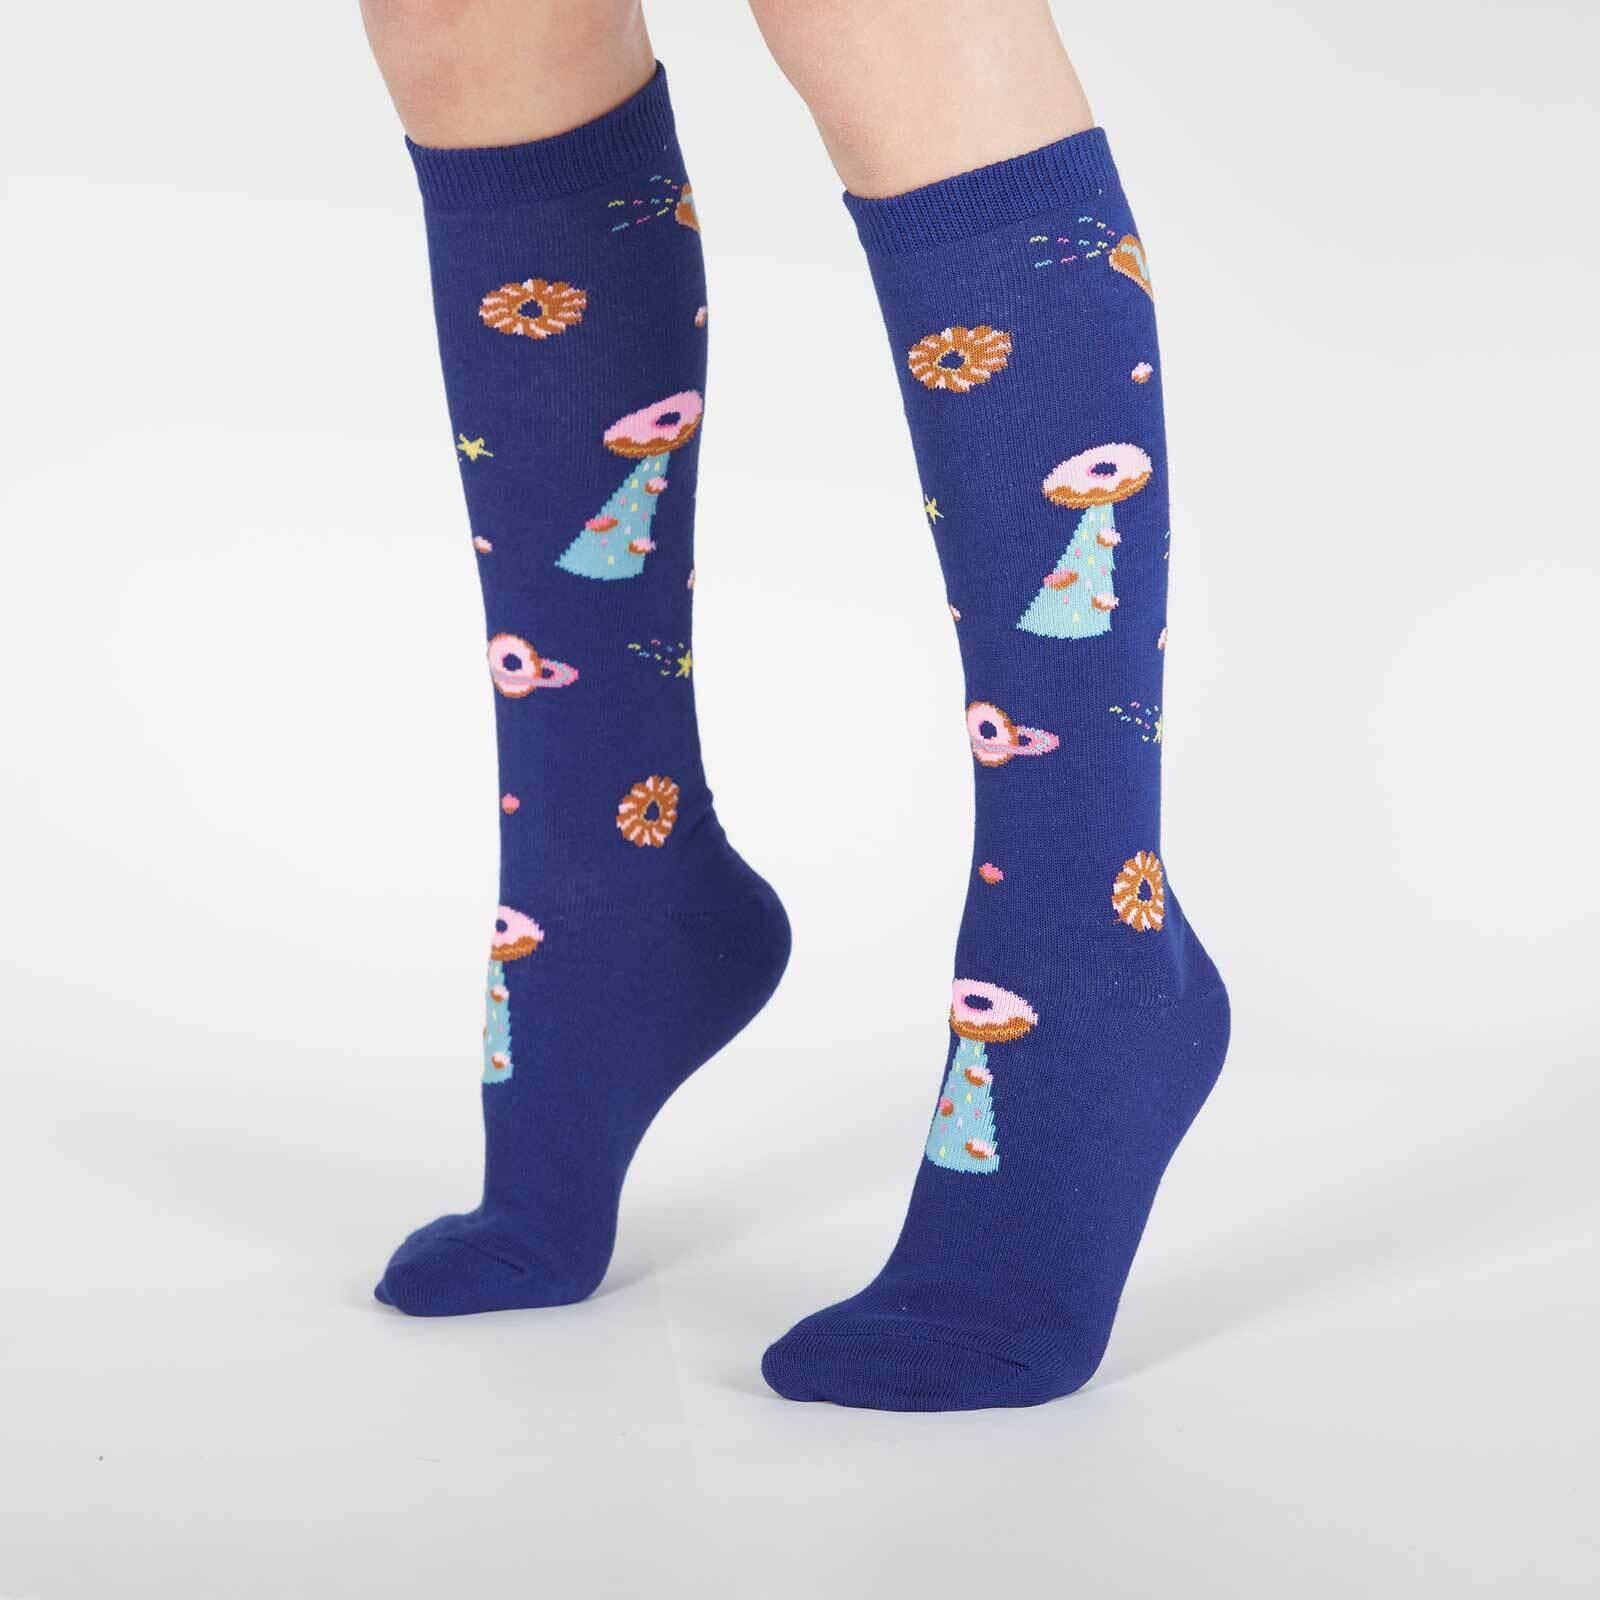 model wearing Glazed Galaxy - Donut Galaxy Knee High Socks - Juniors